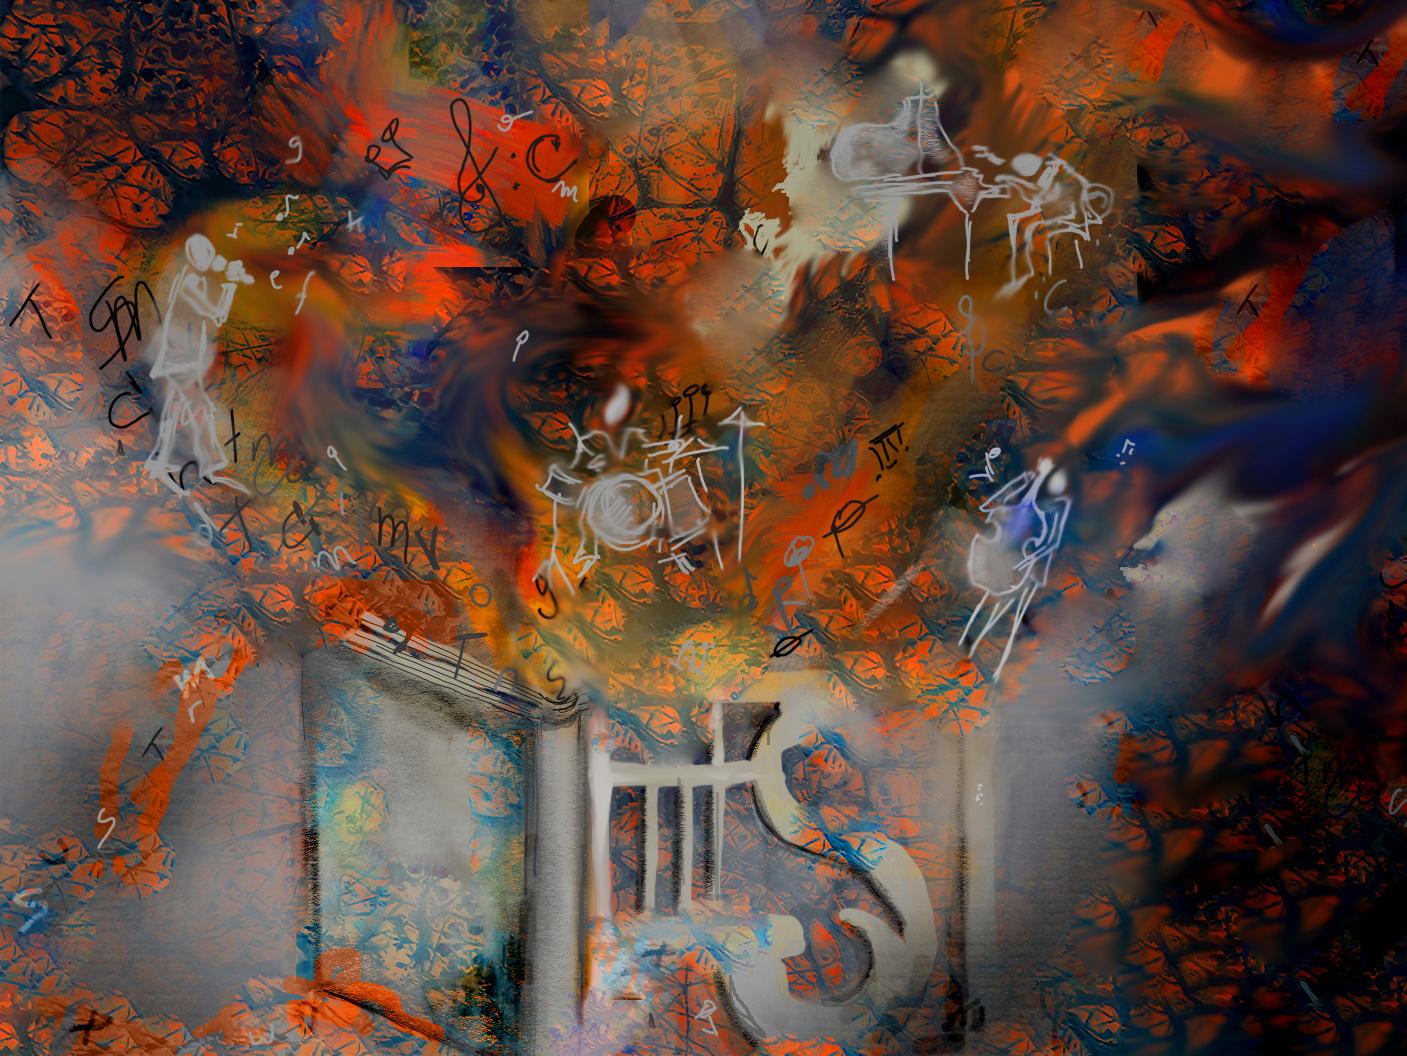 13.05./20:25h Mycelium – Lyrik and Lyrics